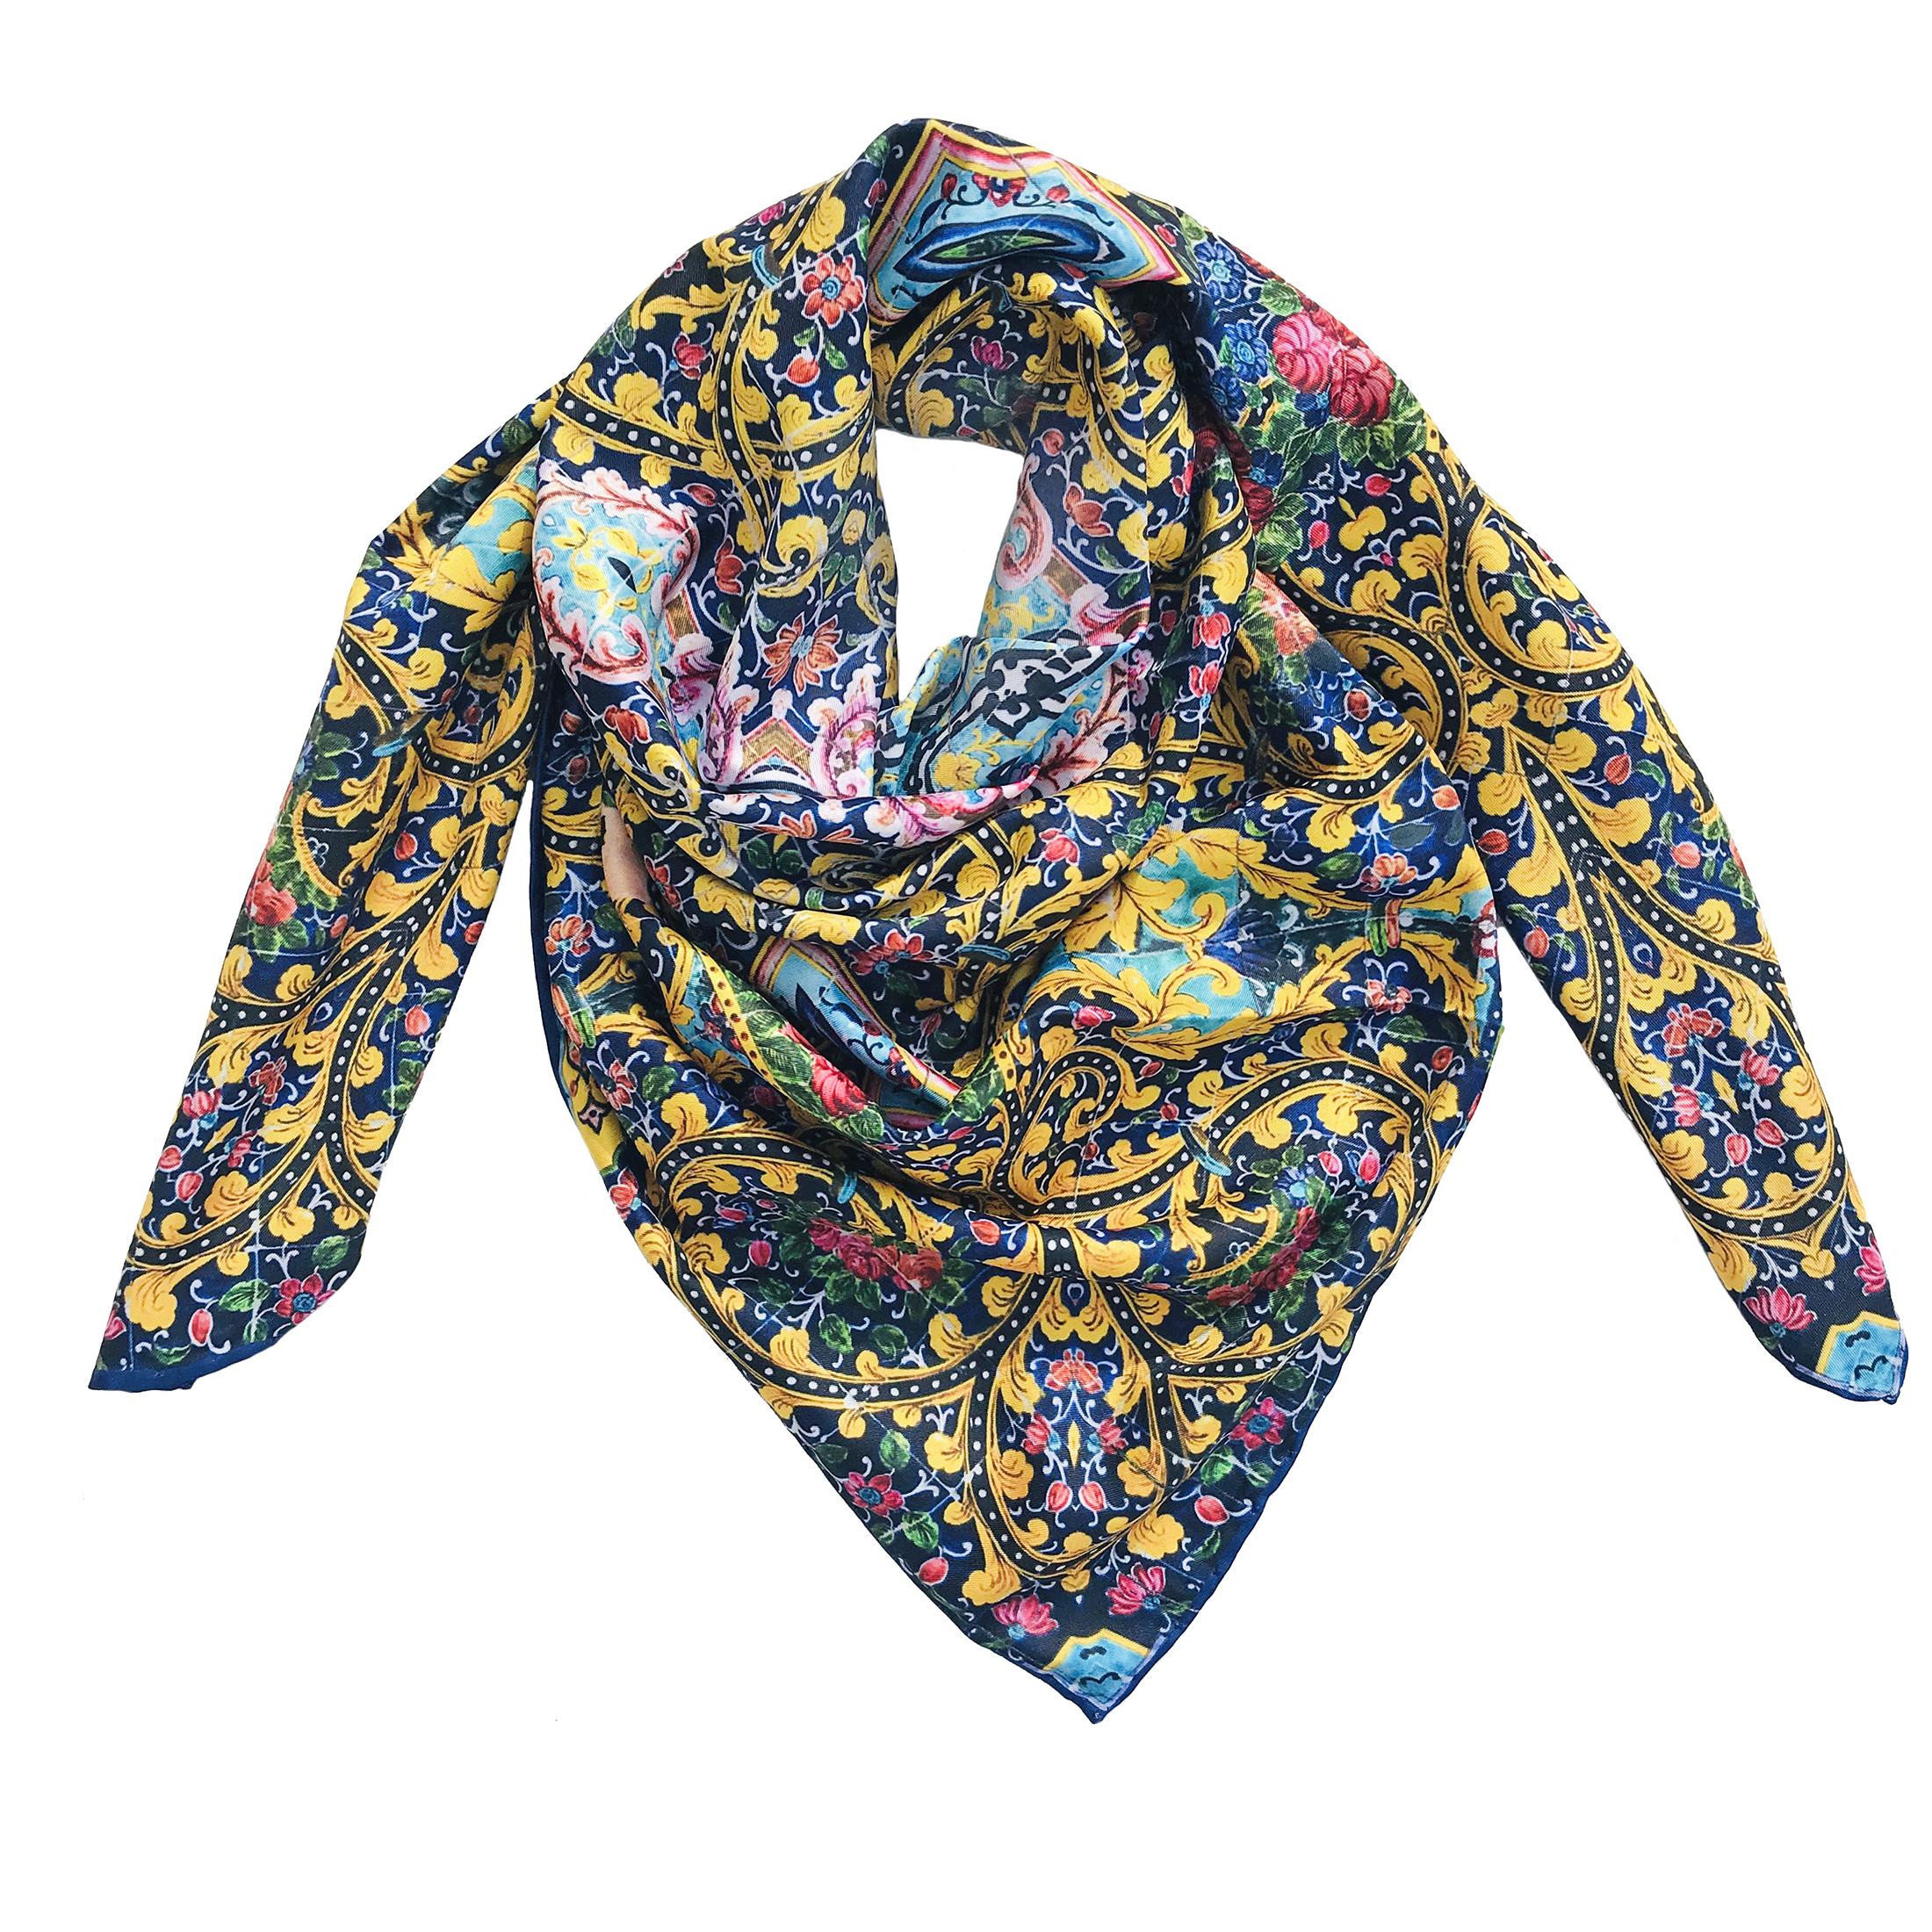 روسری زنانه طرح کاشی